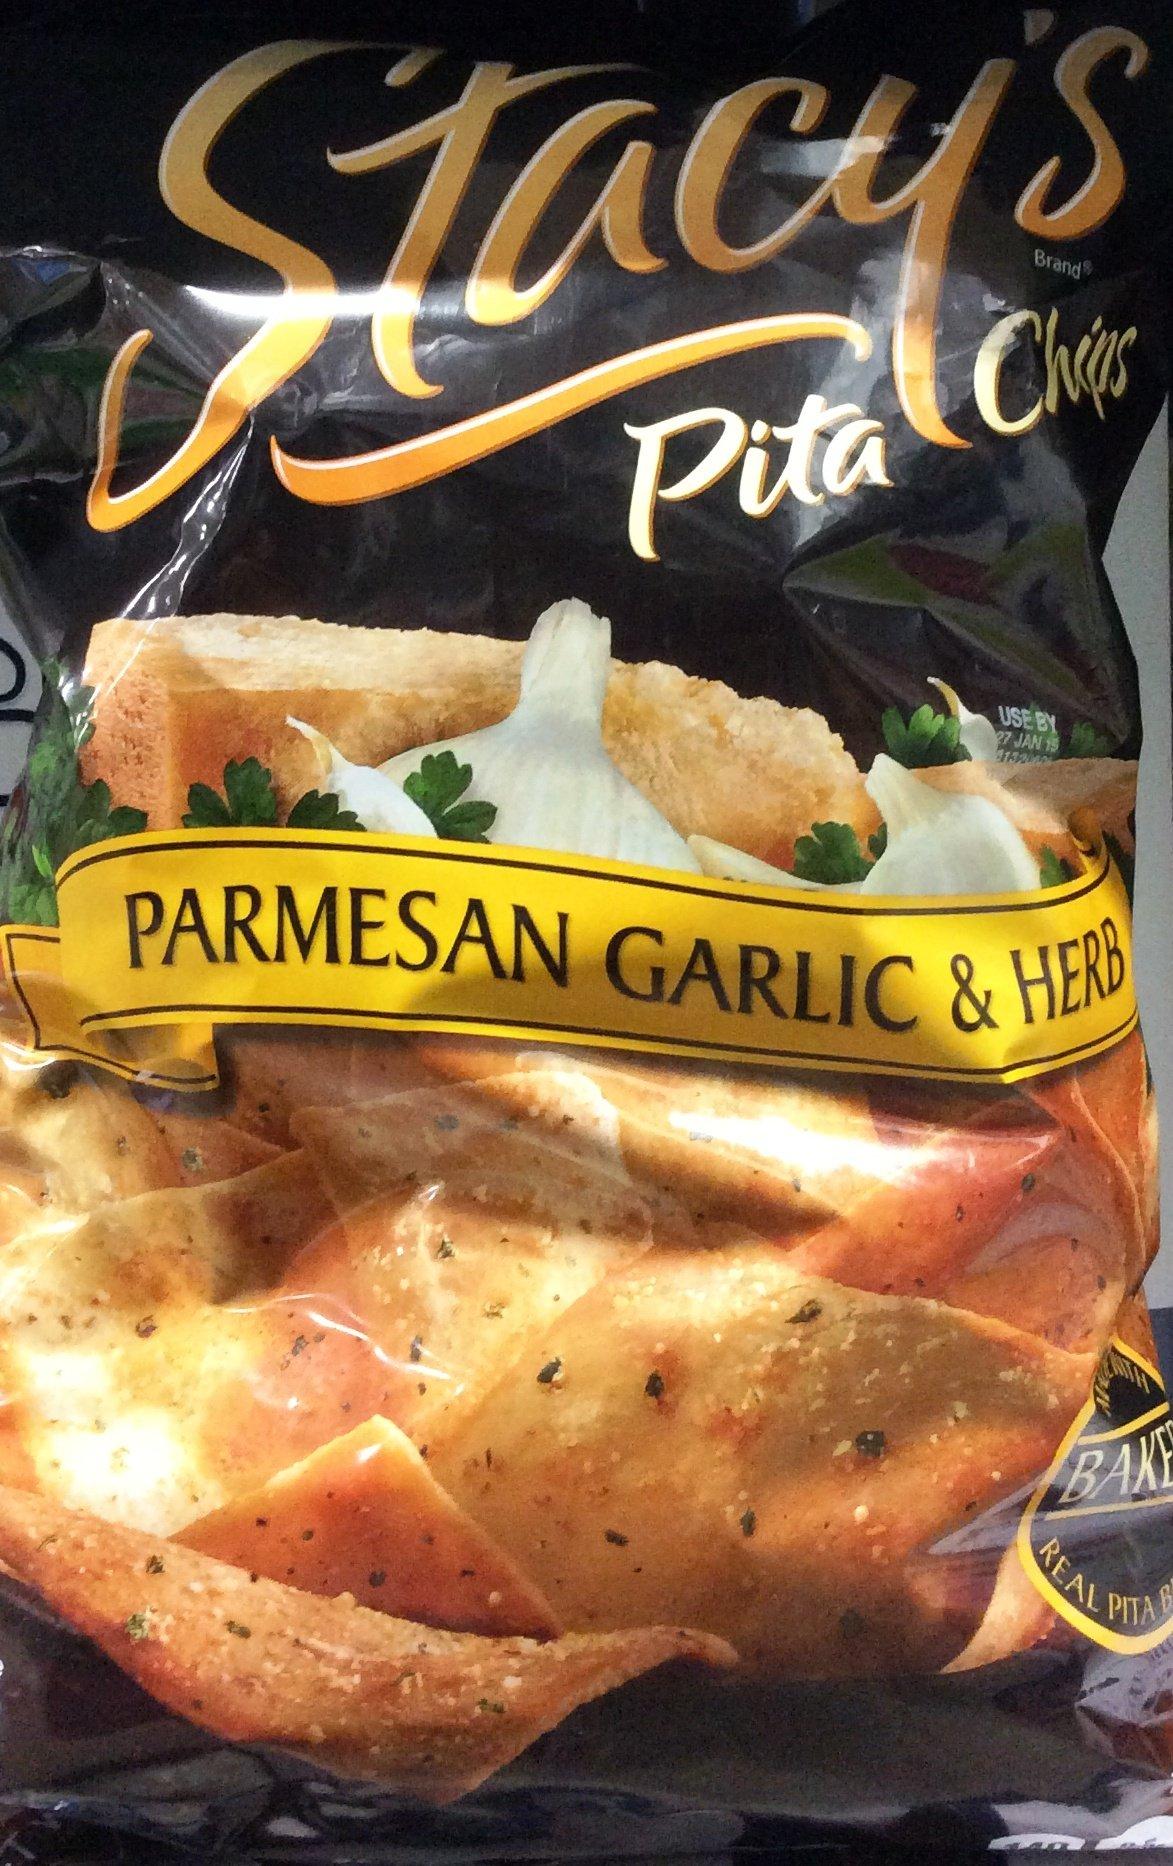 Stacys Parmensan Garlic and Herb Pita Chips, 22 Oz